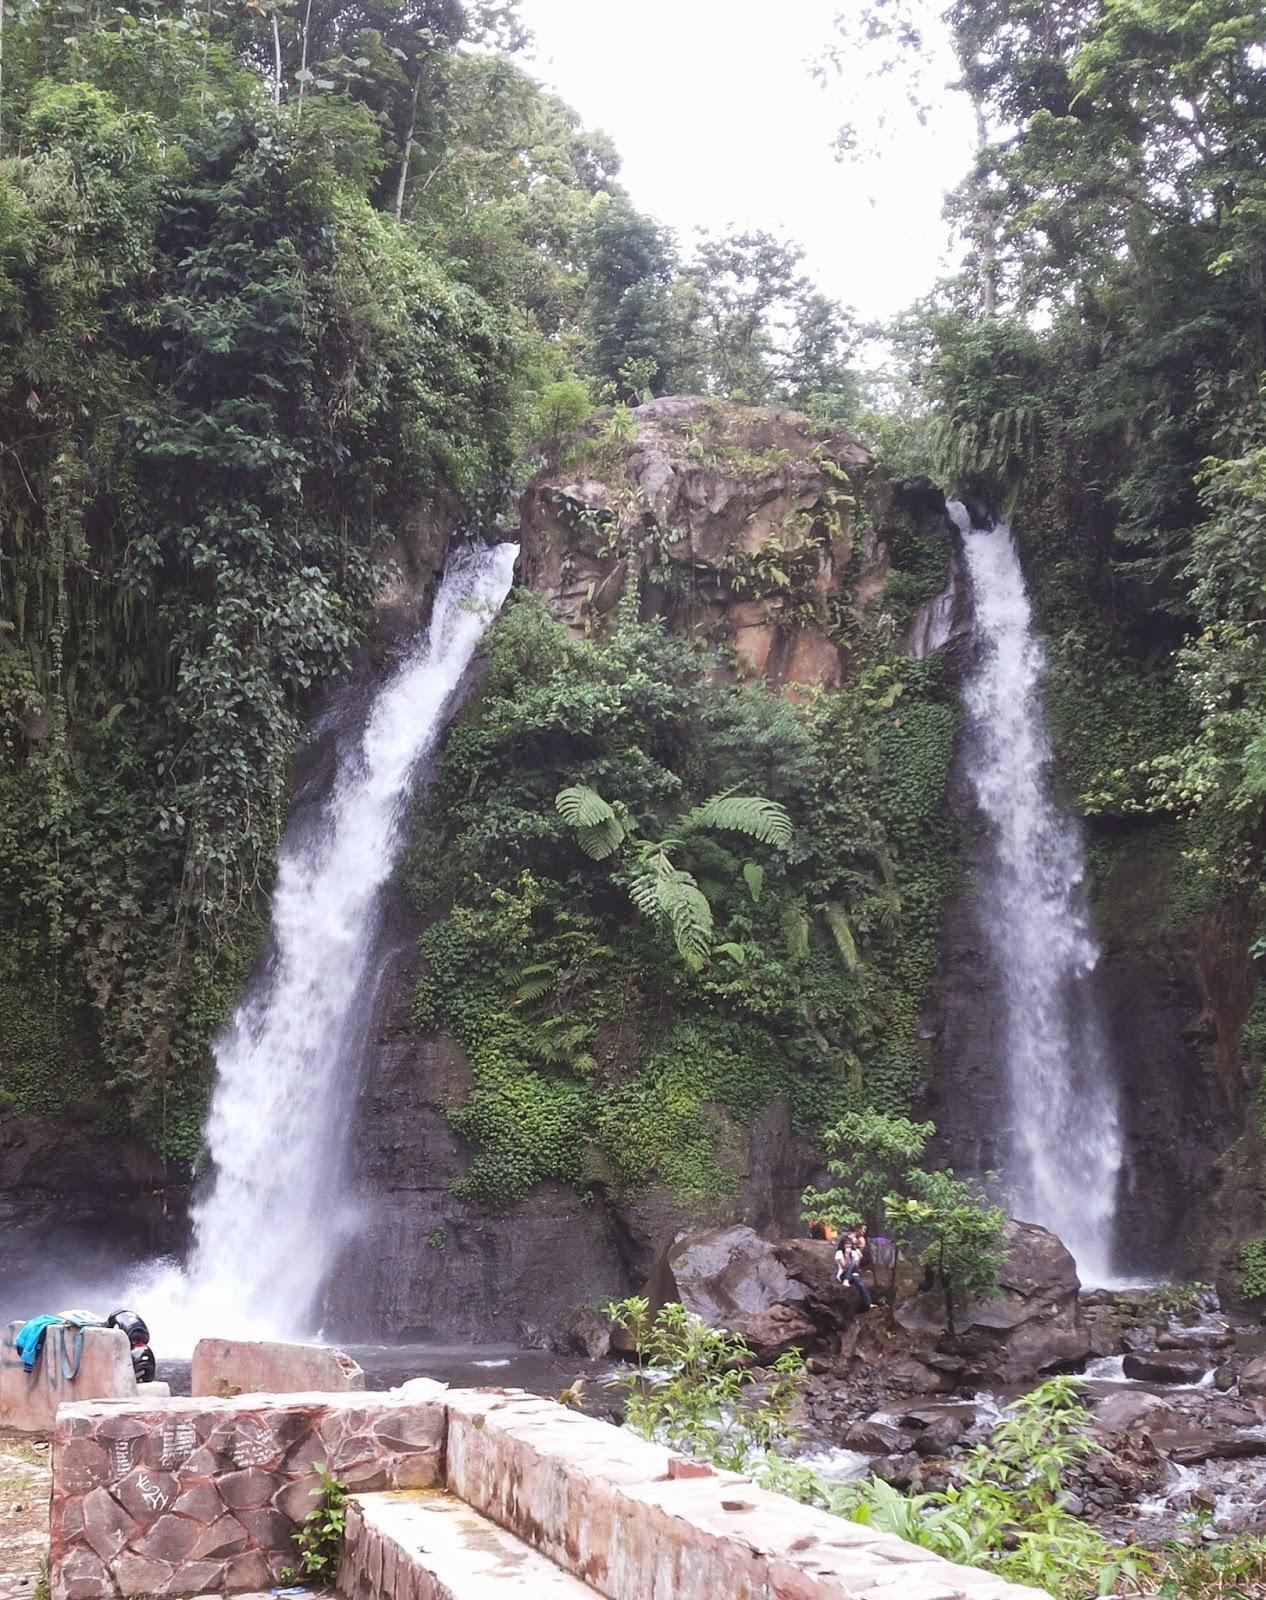 Air terjun Tirto Kemanten, Kalibaru, Banyuwangi.